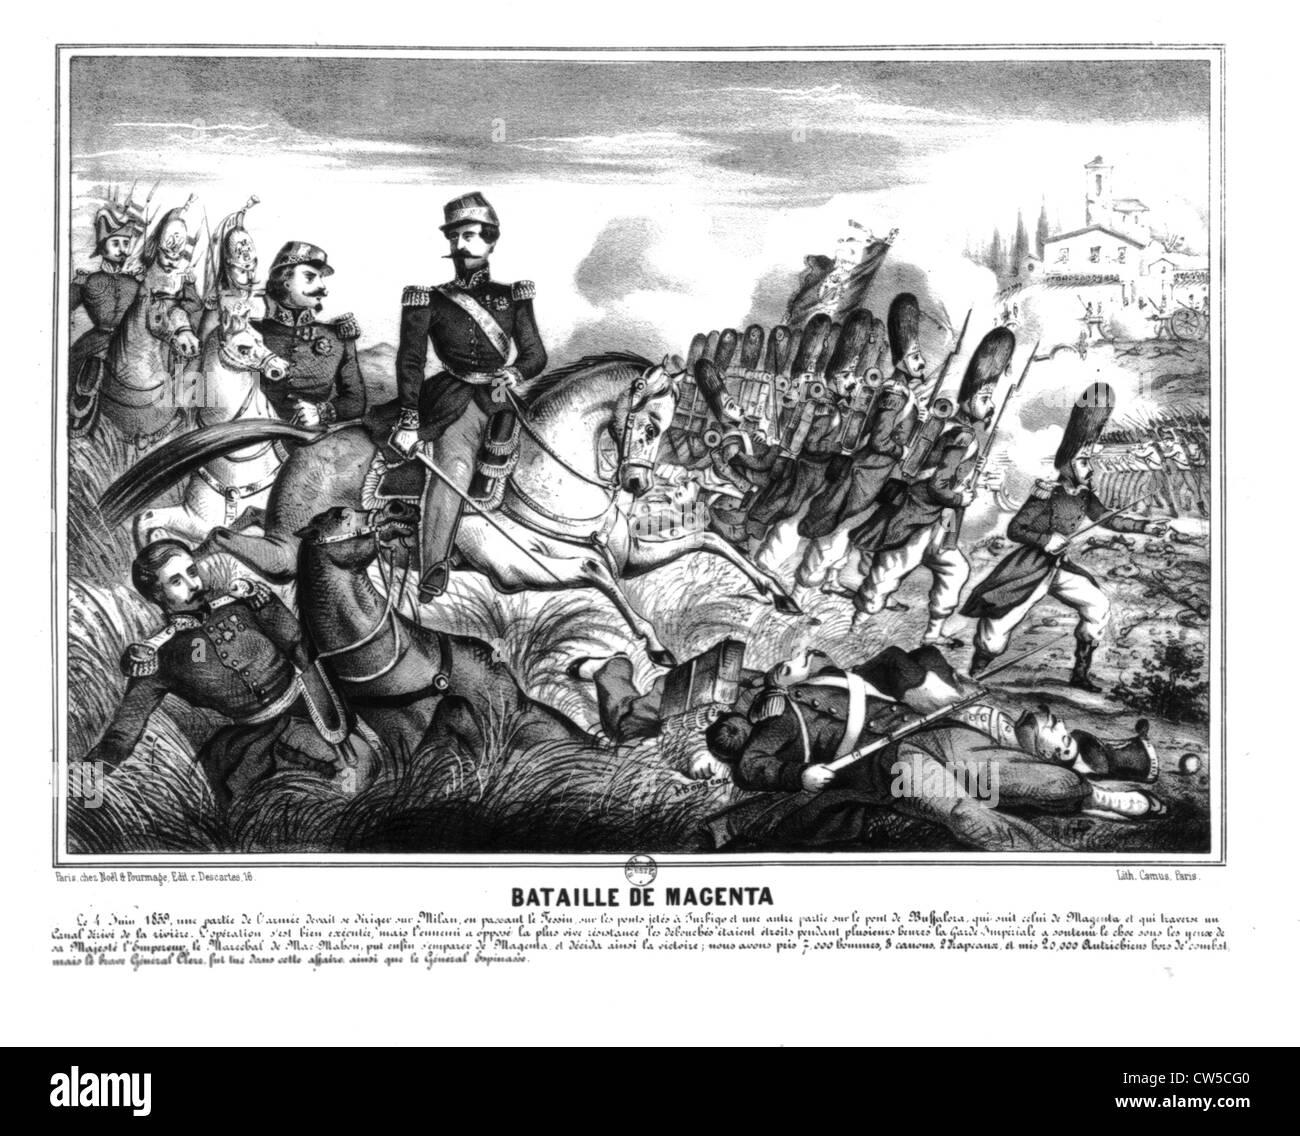 Italian Expedition, Battle of Magenta: Napoleon III and Mac Mahon - Stock Image